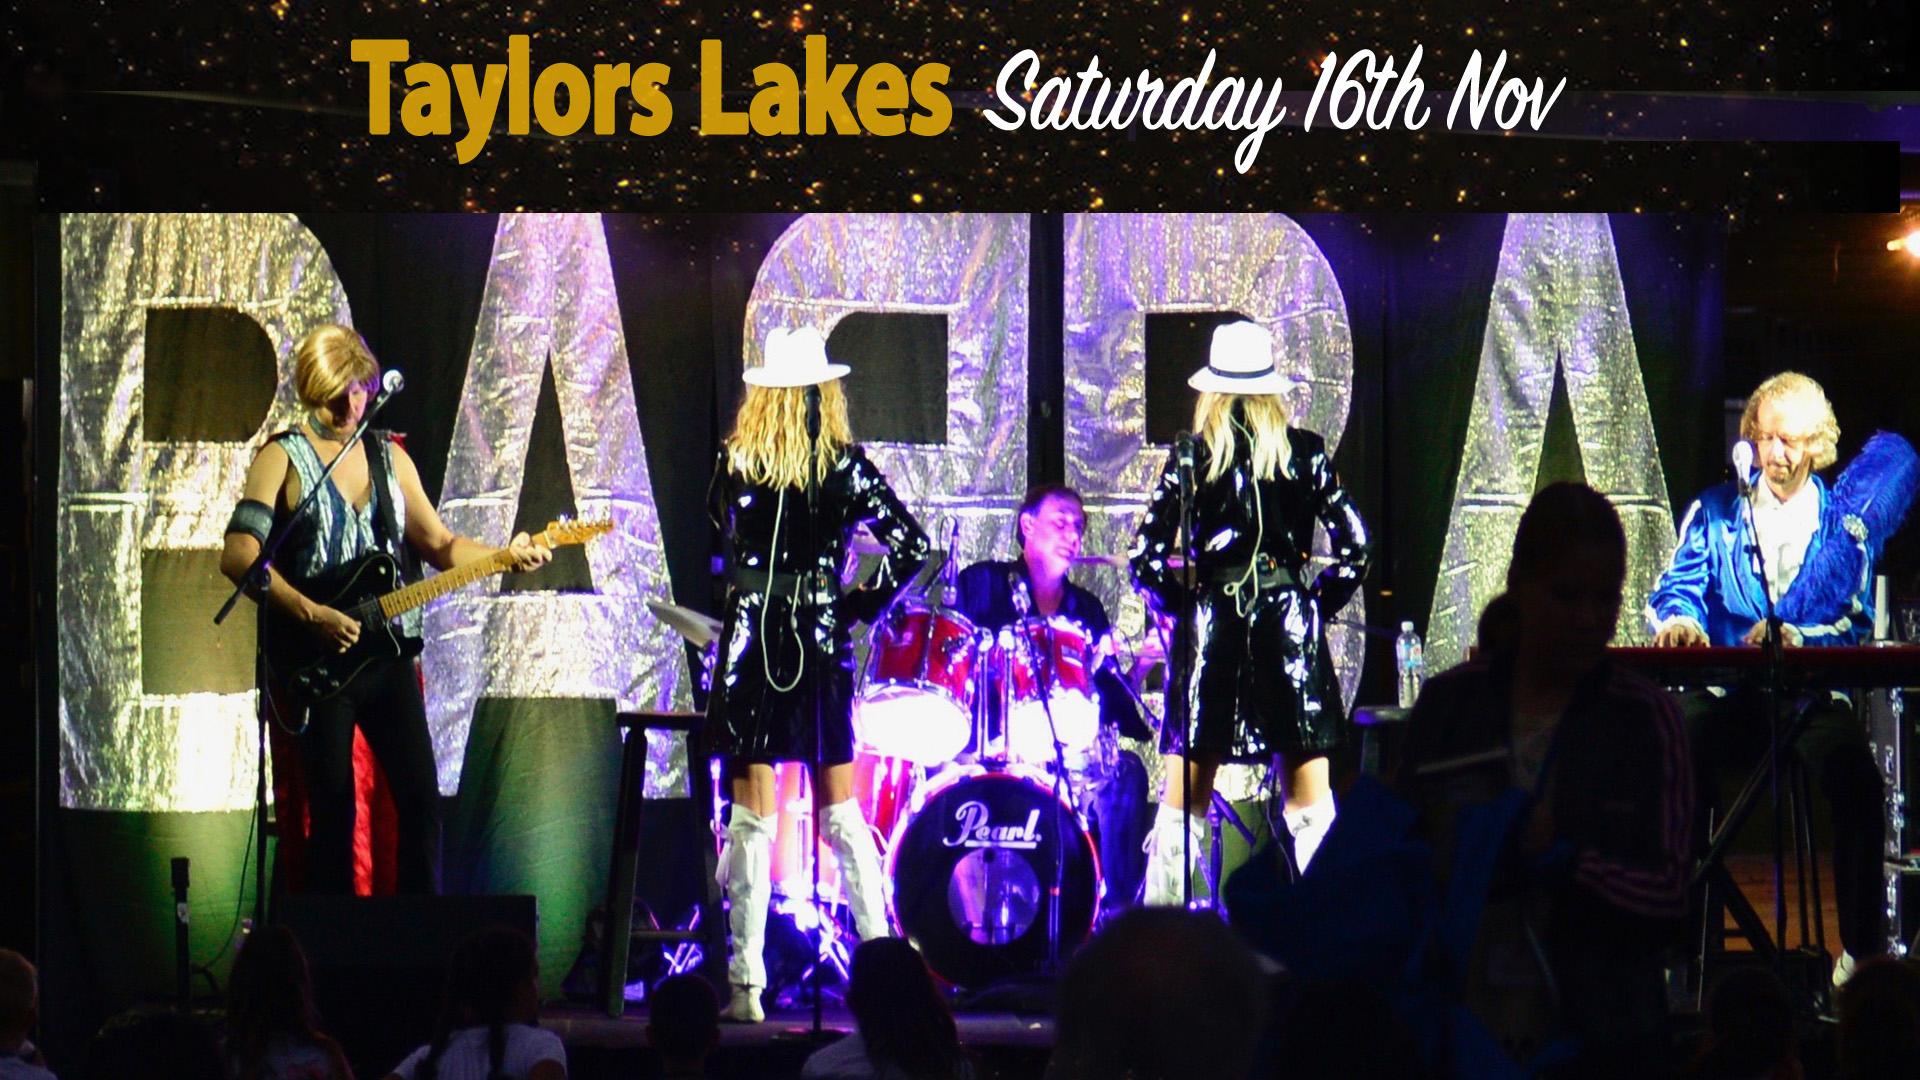 Taylors Lakes 2.jpg